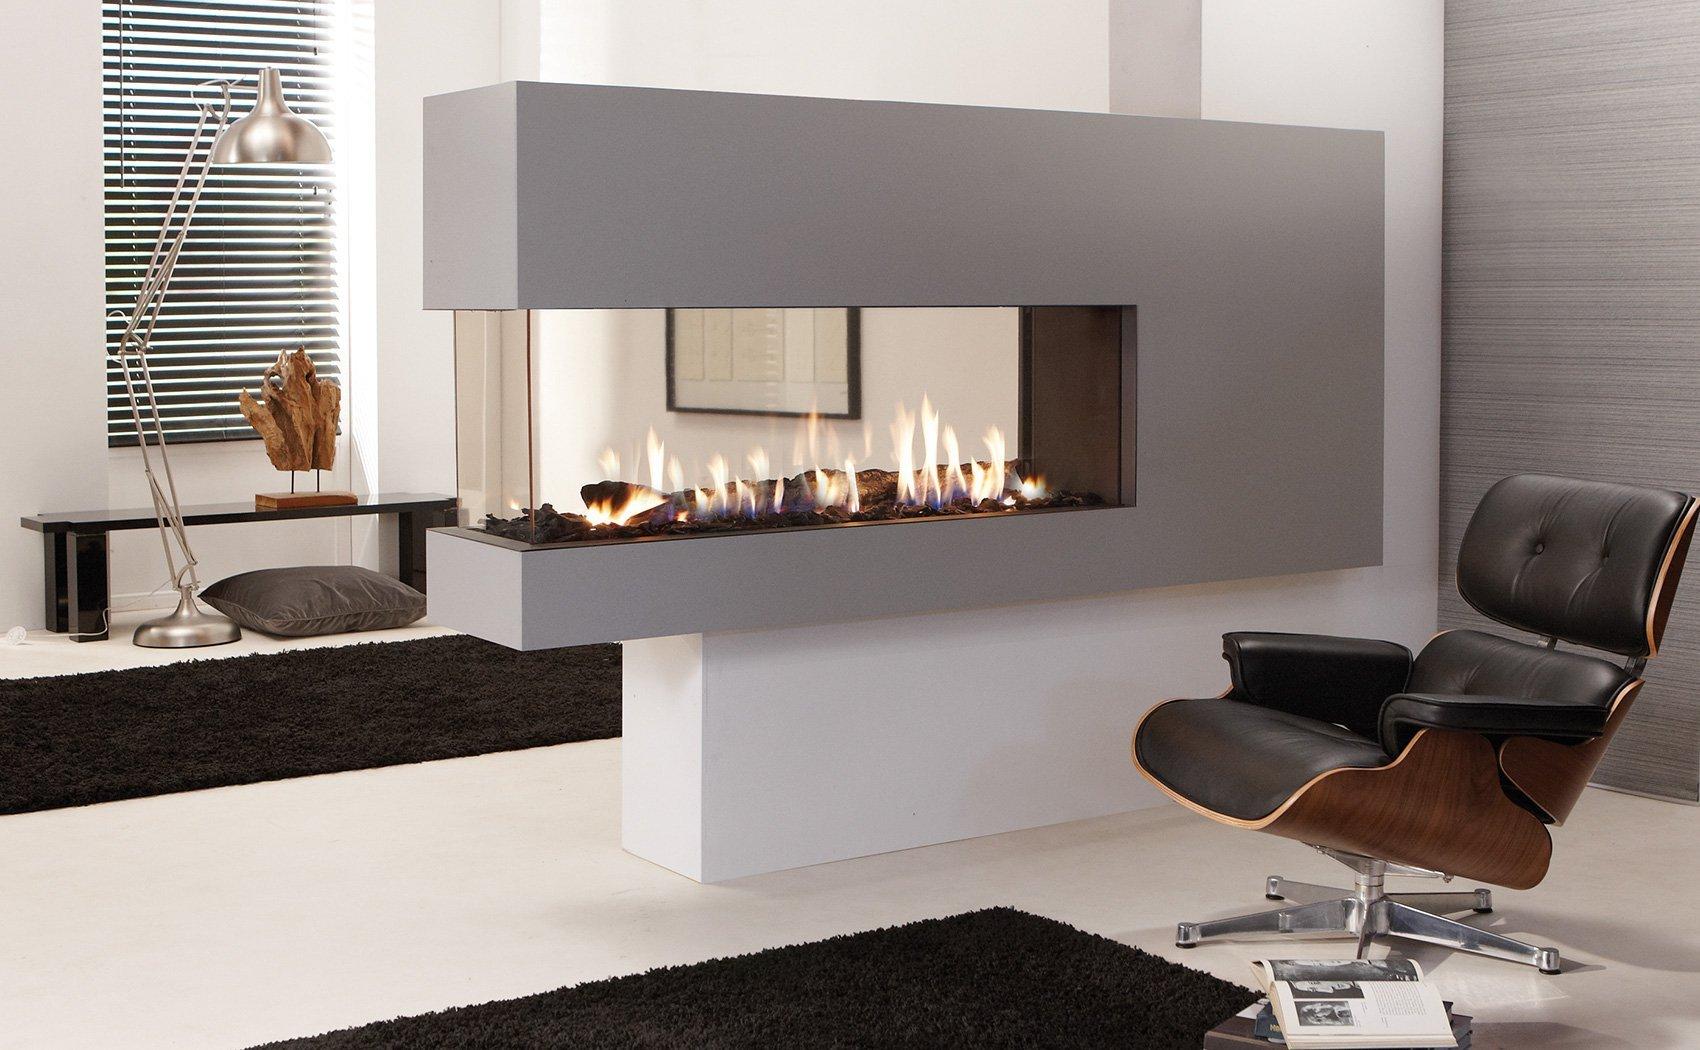 Element 4 Summit 140 gas fireplace